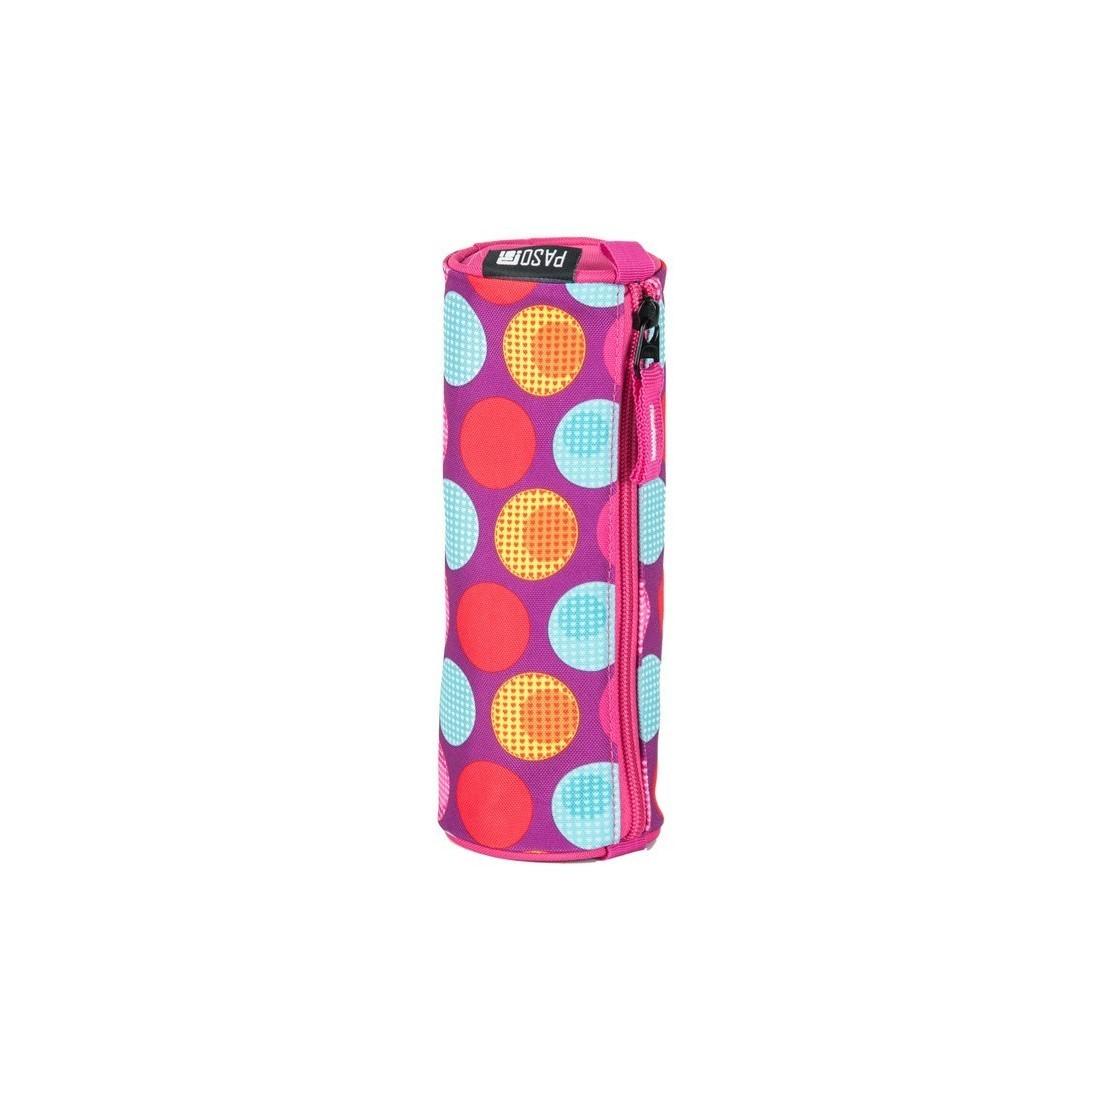 6b4d2aaccd427 Piórnik tuba Paso Unique Pink Spot - kolorowe kropki - plecak ...